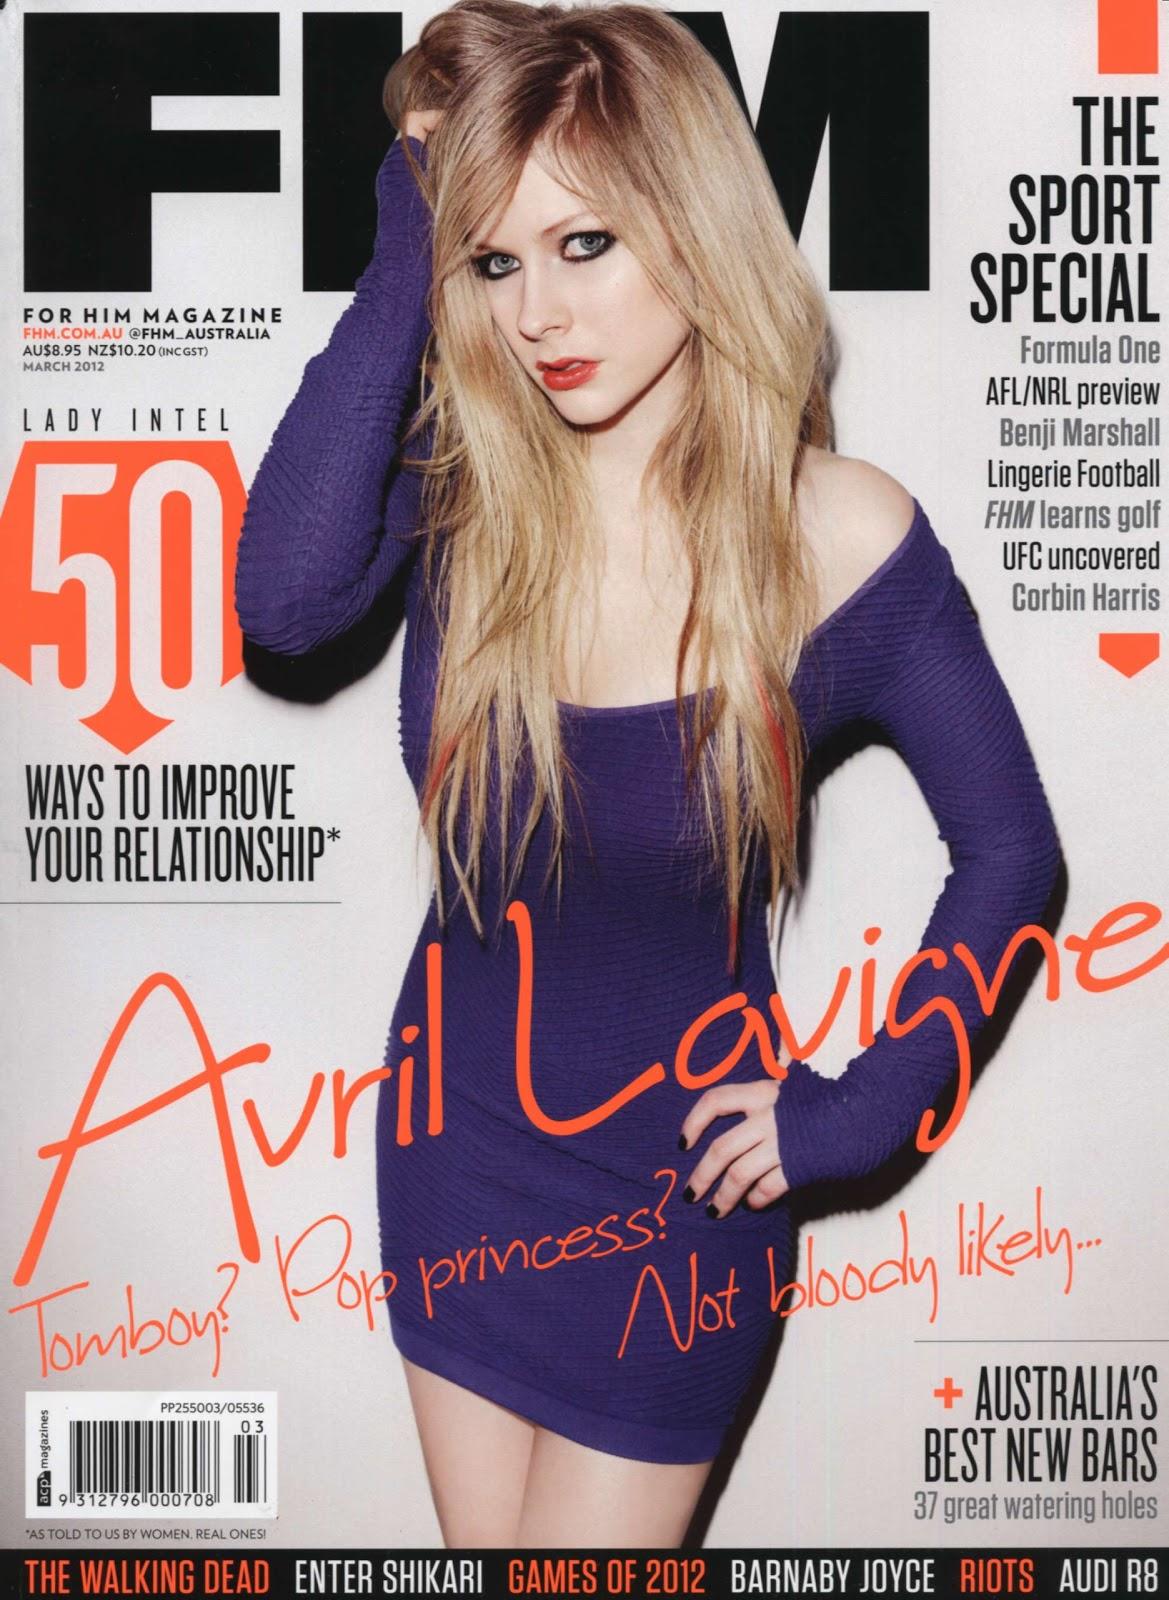 http://4.bp.blogspot.com/-yYHWUPtV-8U/T0vVFNn4asI/AAAAAAAAItc/KtpWvjvXGUg/s1600/Avril+Lavigne+legs+for+FHM+Magazine+Australia+2012-06.jpg